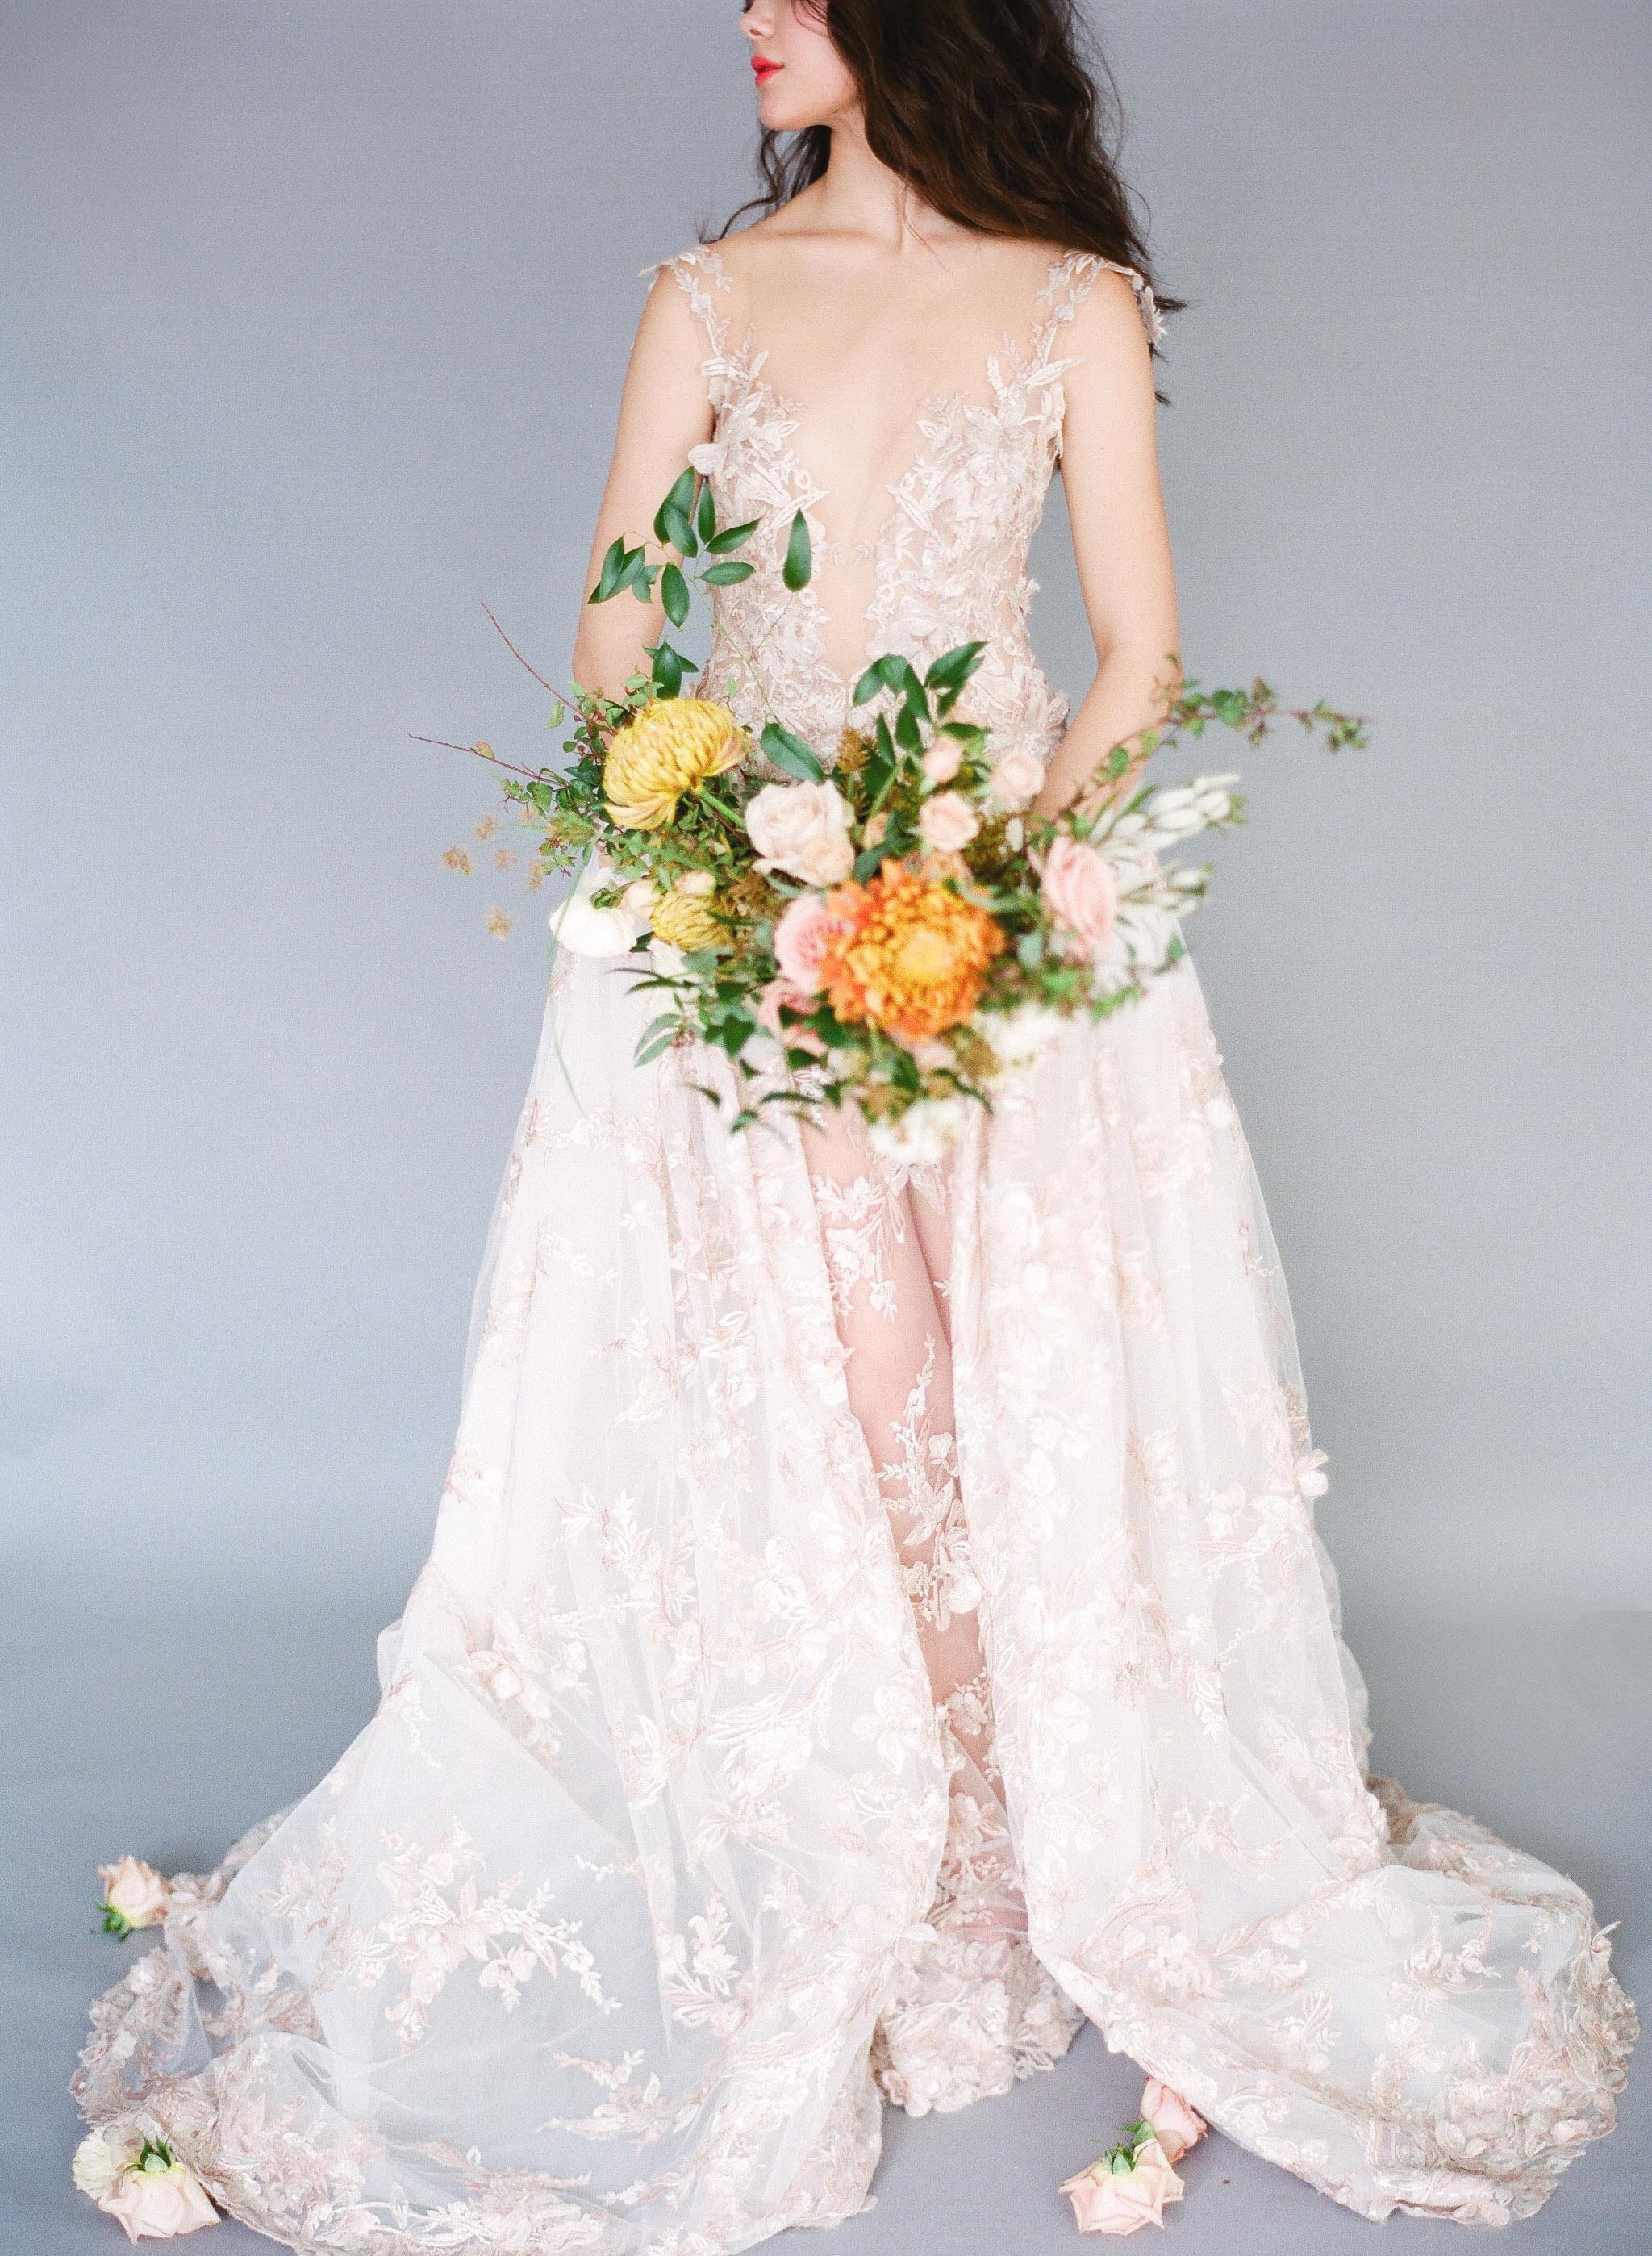 JennySoiPhotography-Bridaleditorial-173.jpg